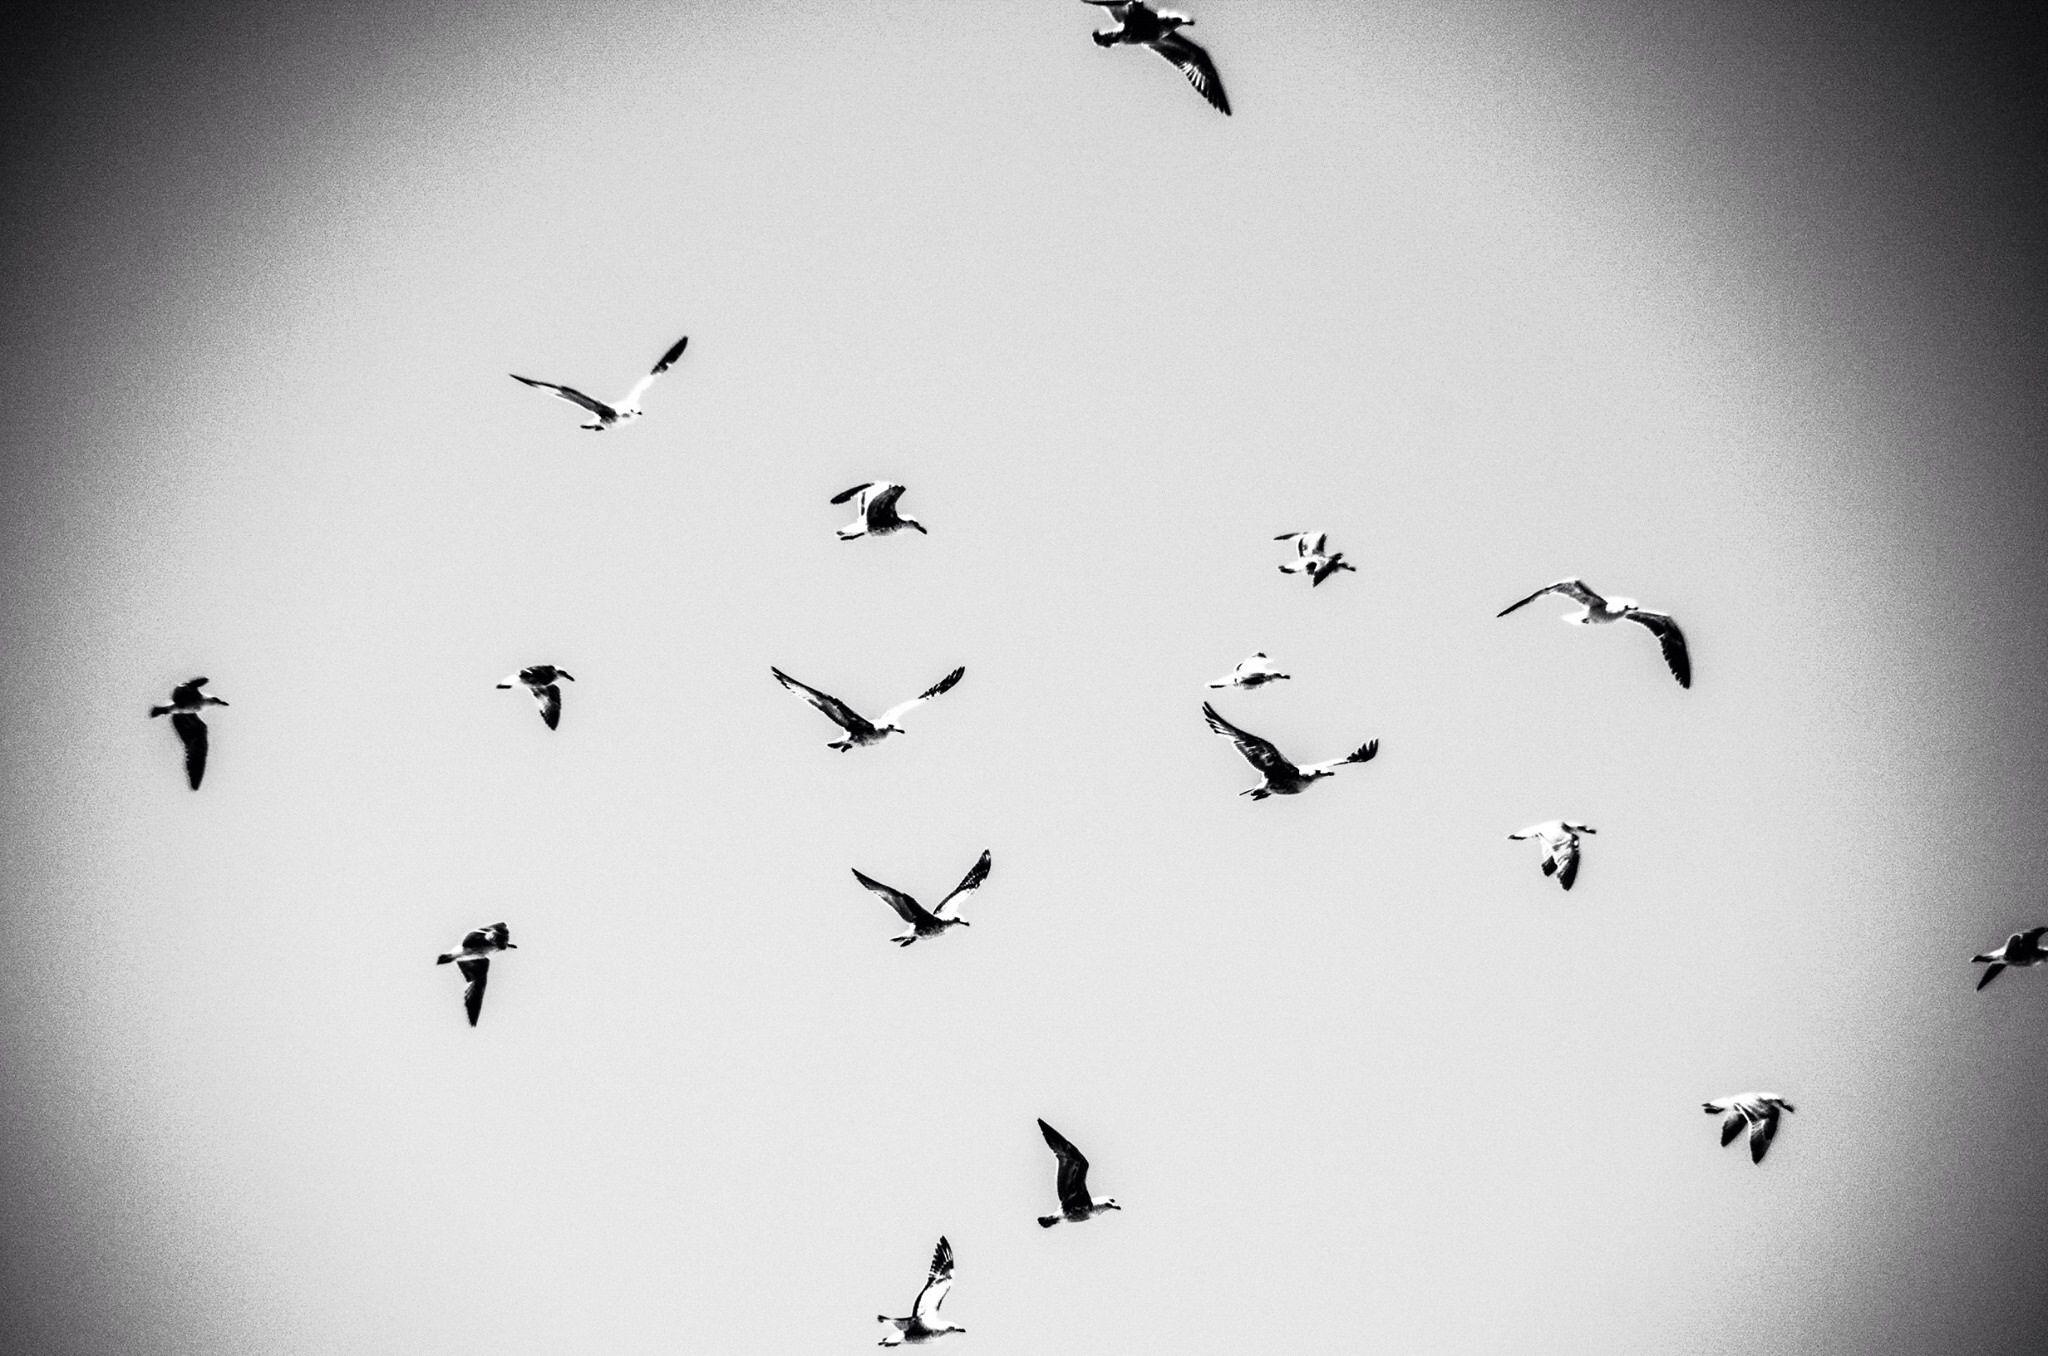 Volar by juanalopez